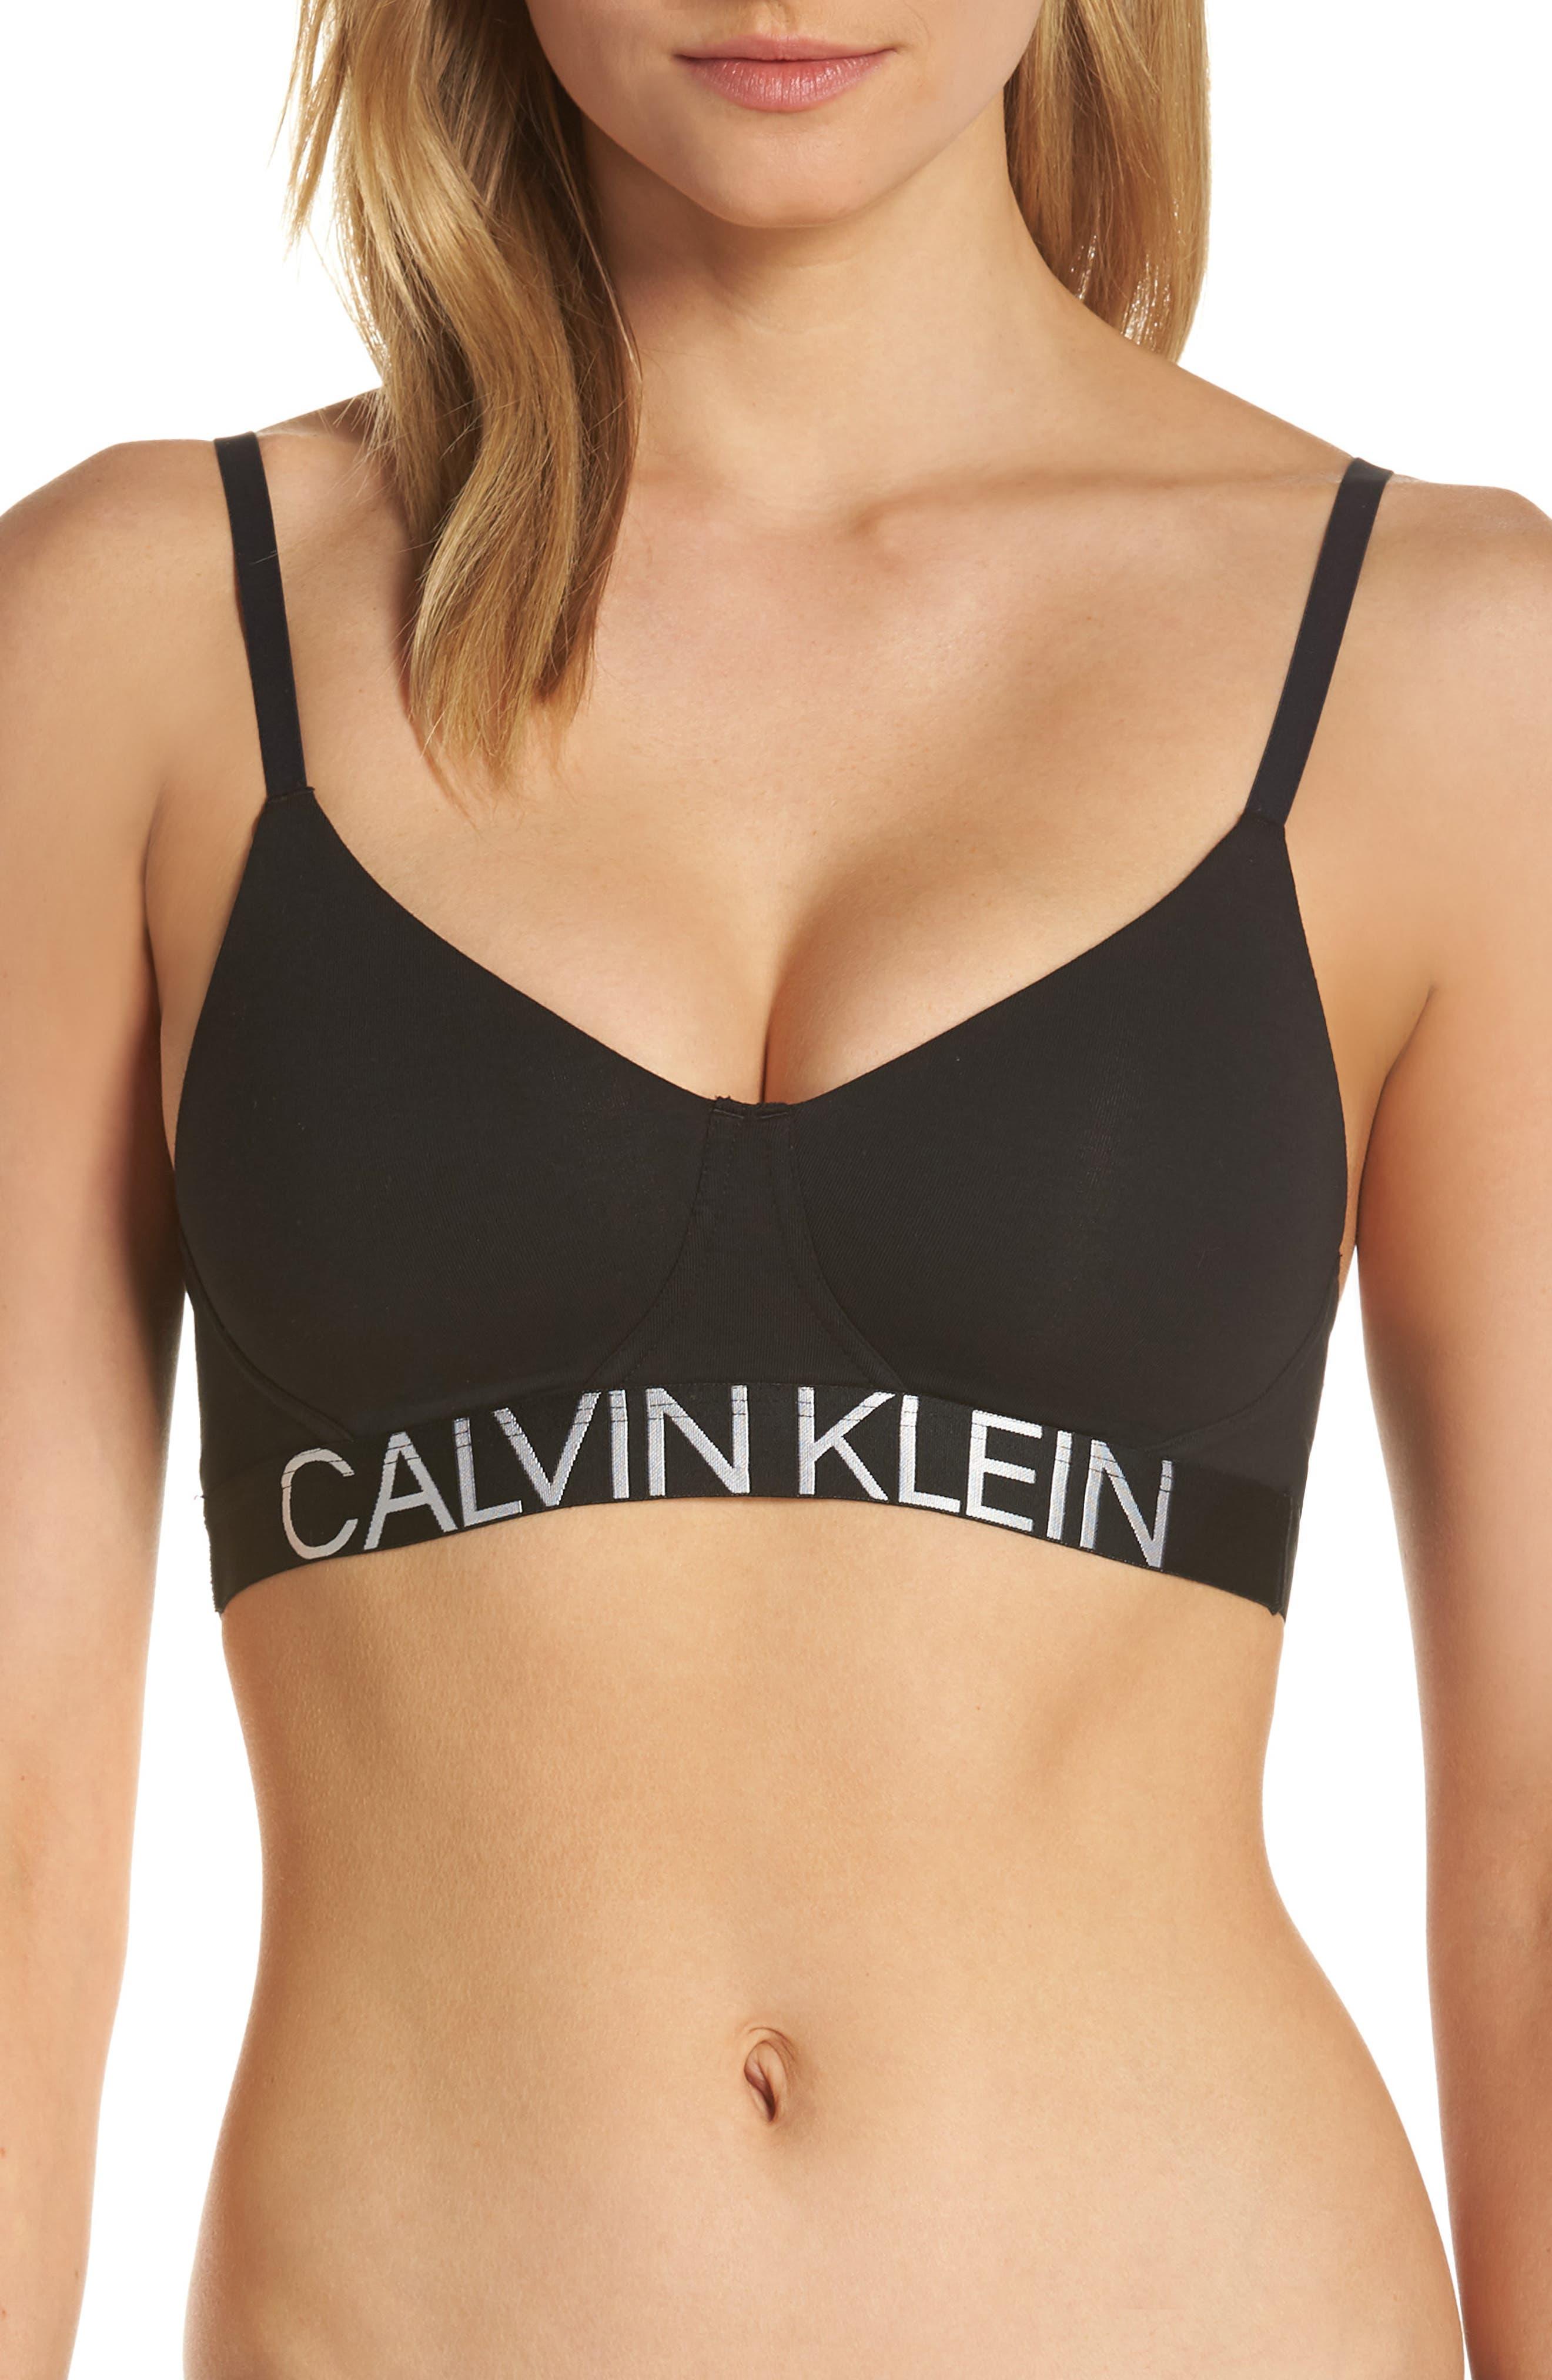 CALVIN KLEIN Statement 1981 Convertible Soft Cup Bralette, Main, color, BLACK